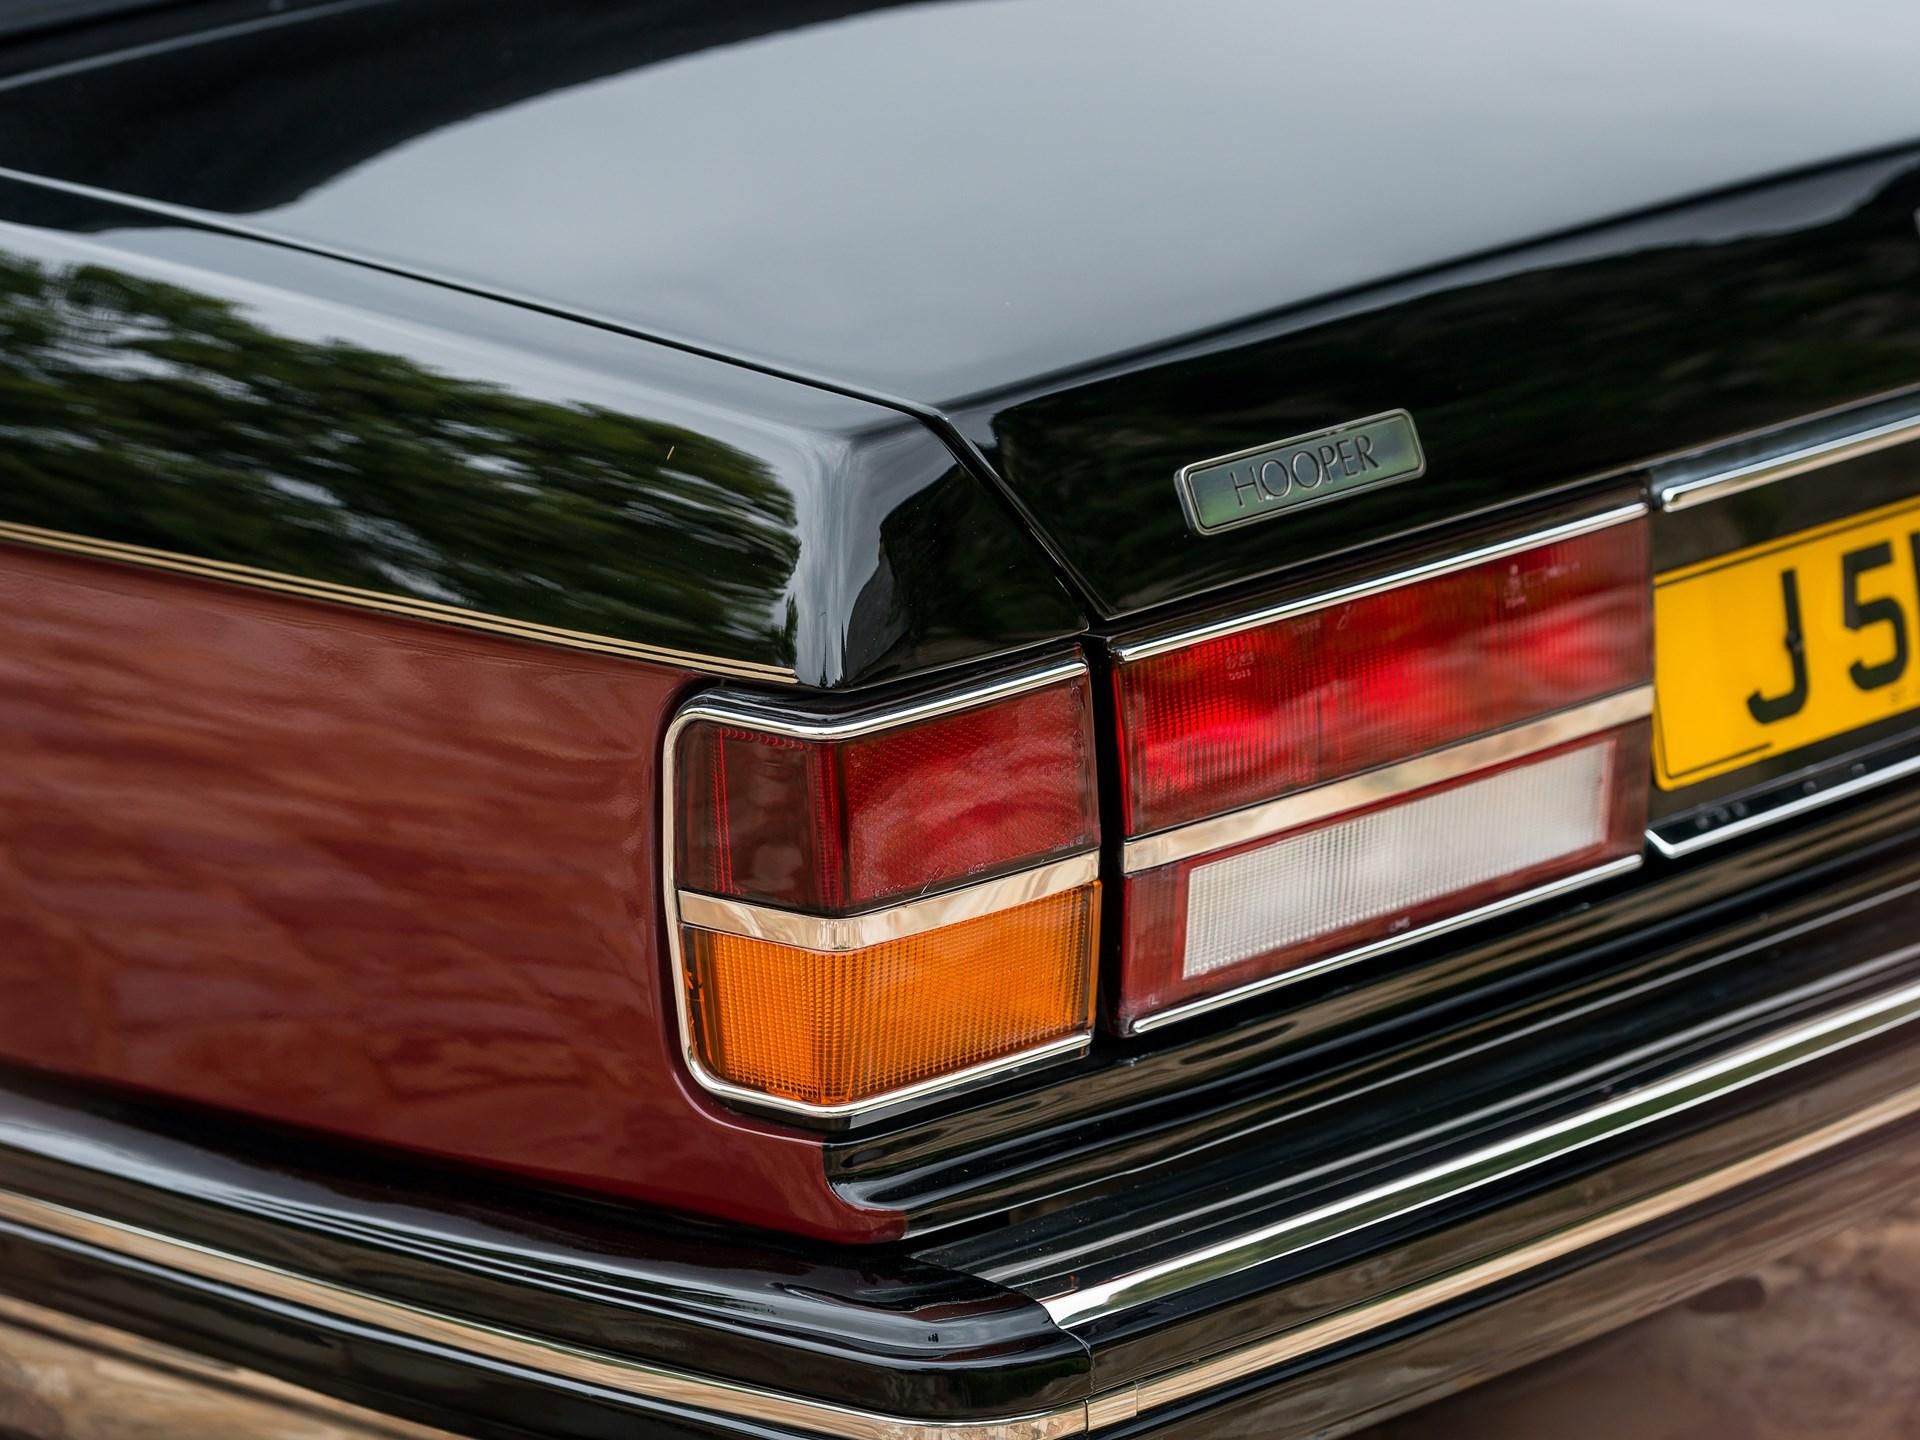 1989 Rolls-Royce Silver Spirit I Emperor State Landaulet by Hooper